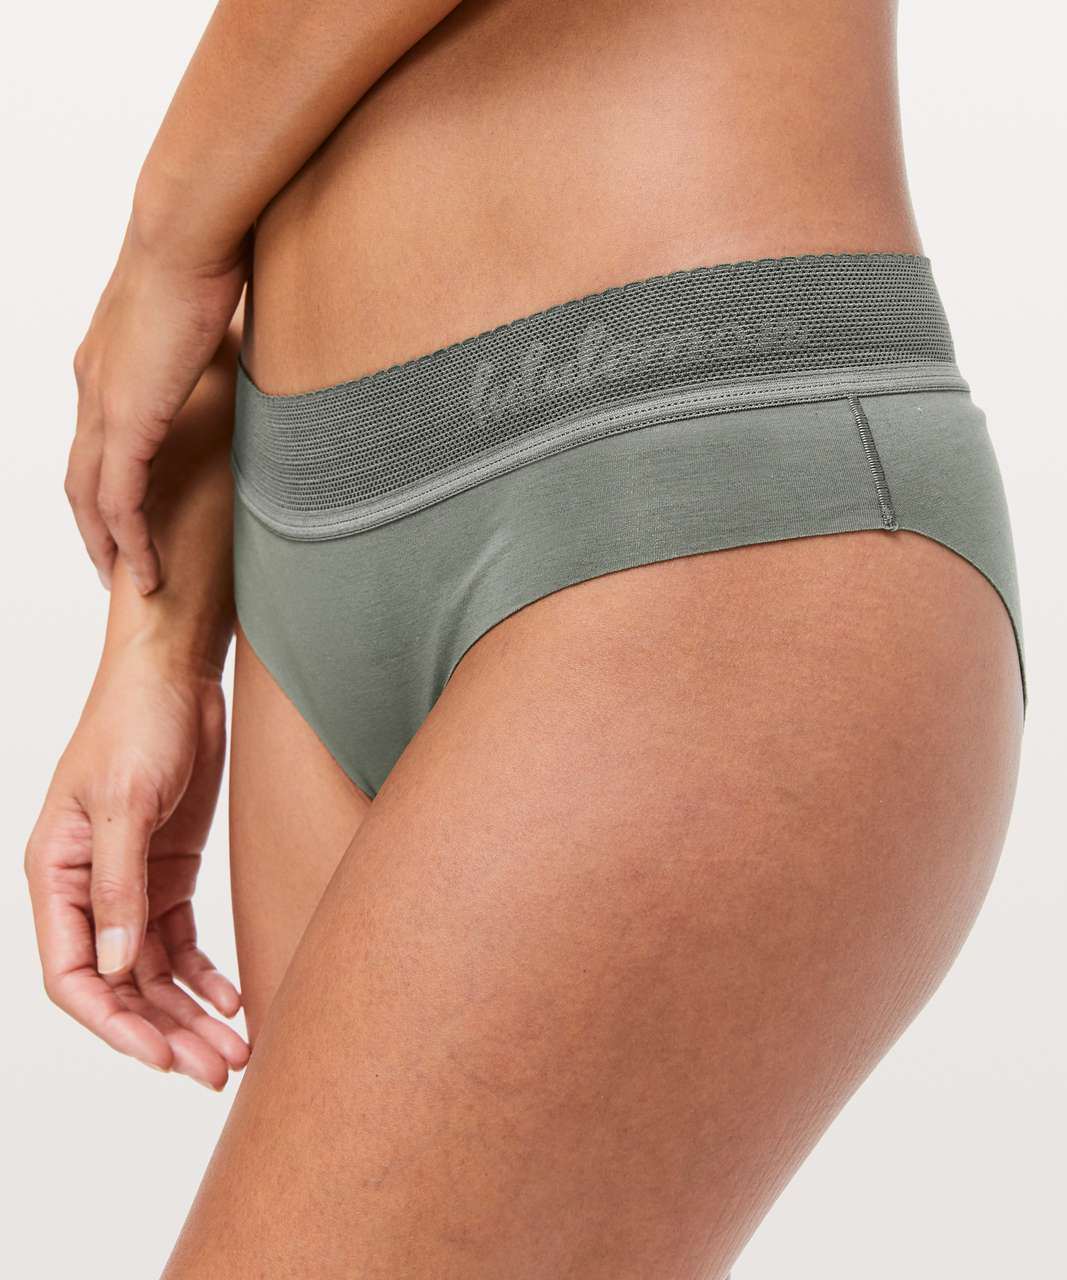 Lululemon Ever Essentials Bikini - Grey Sage